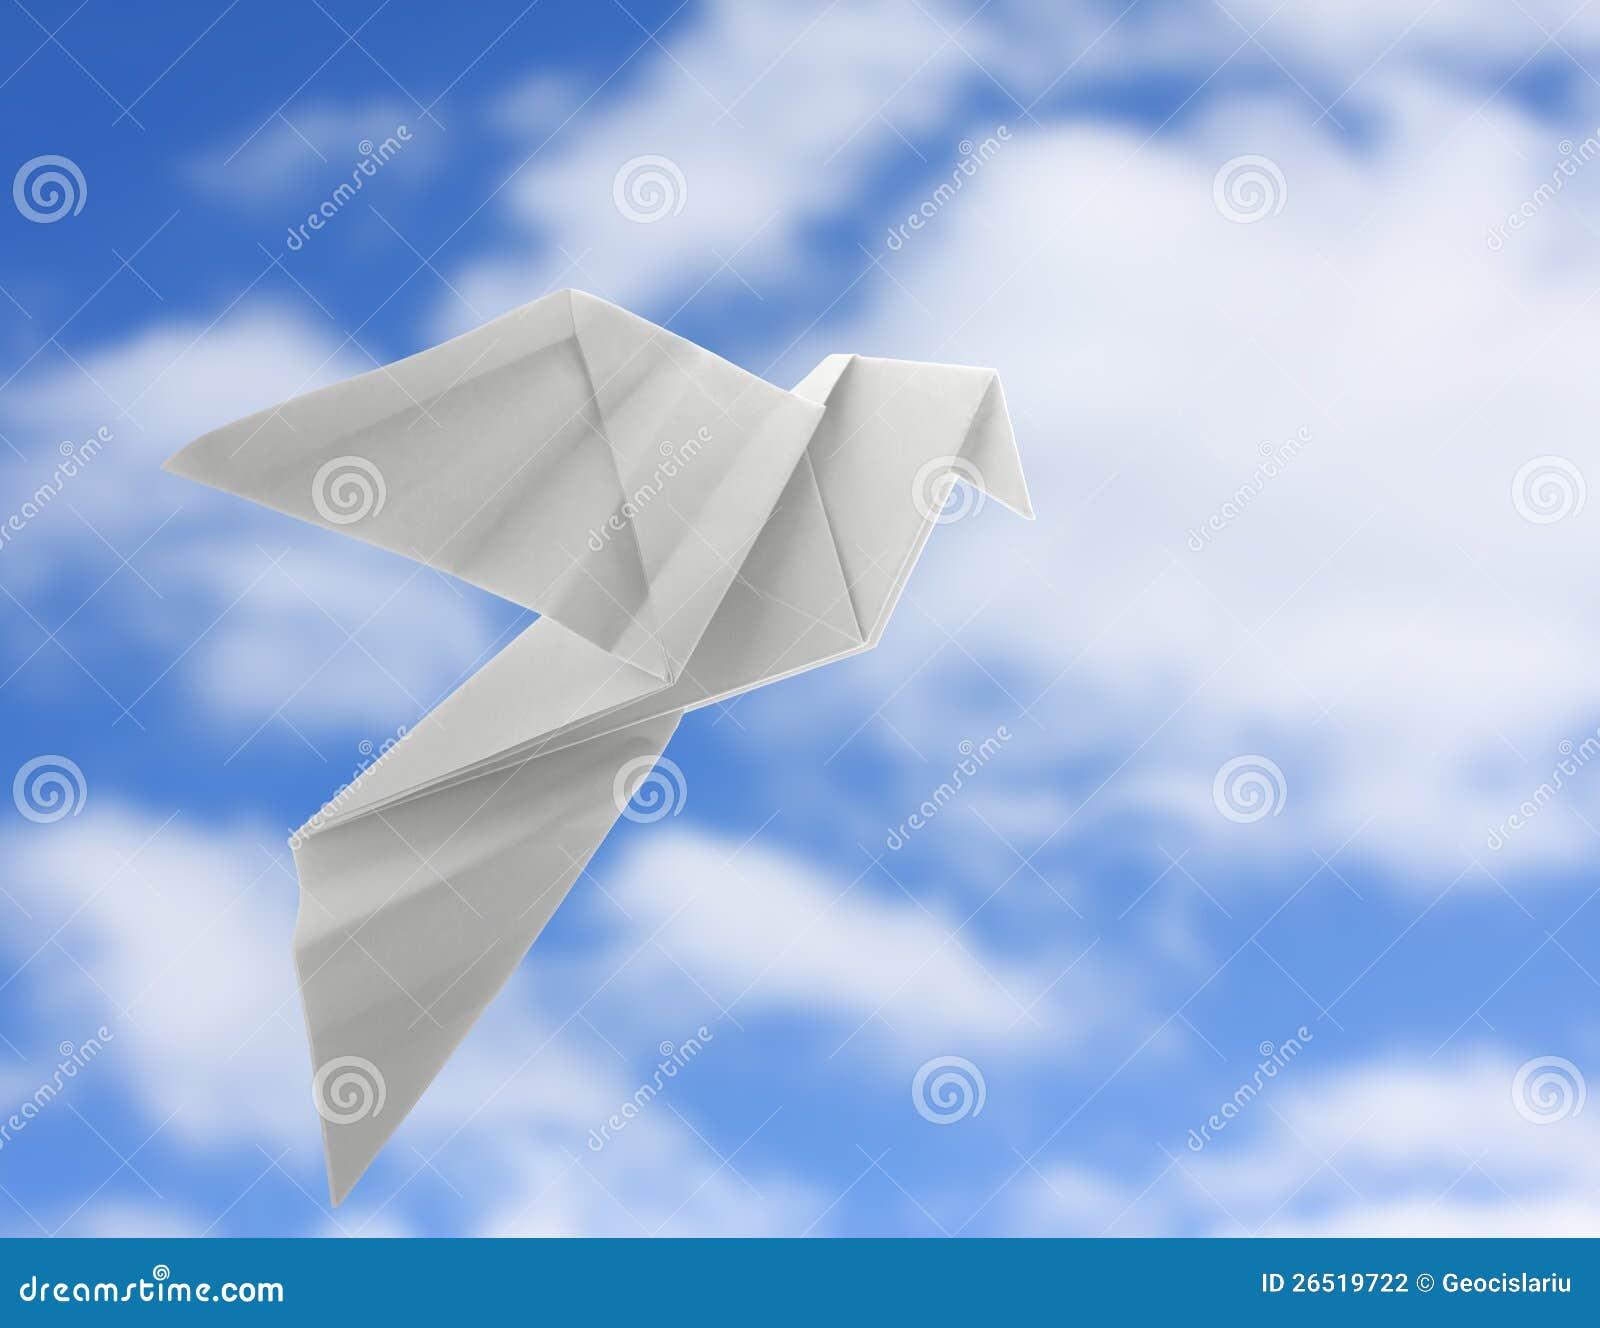 Origami Dove Stock Photography - Image: 26519722 - photo#30